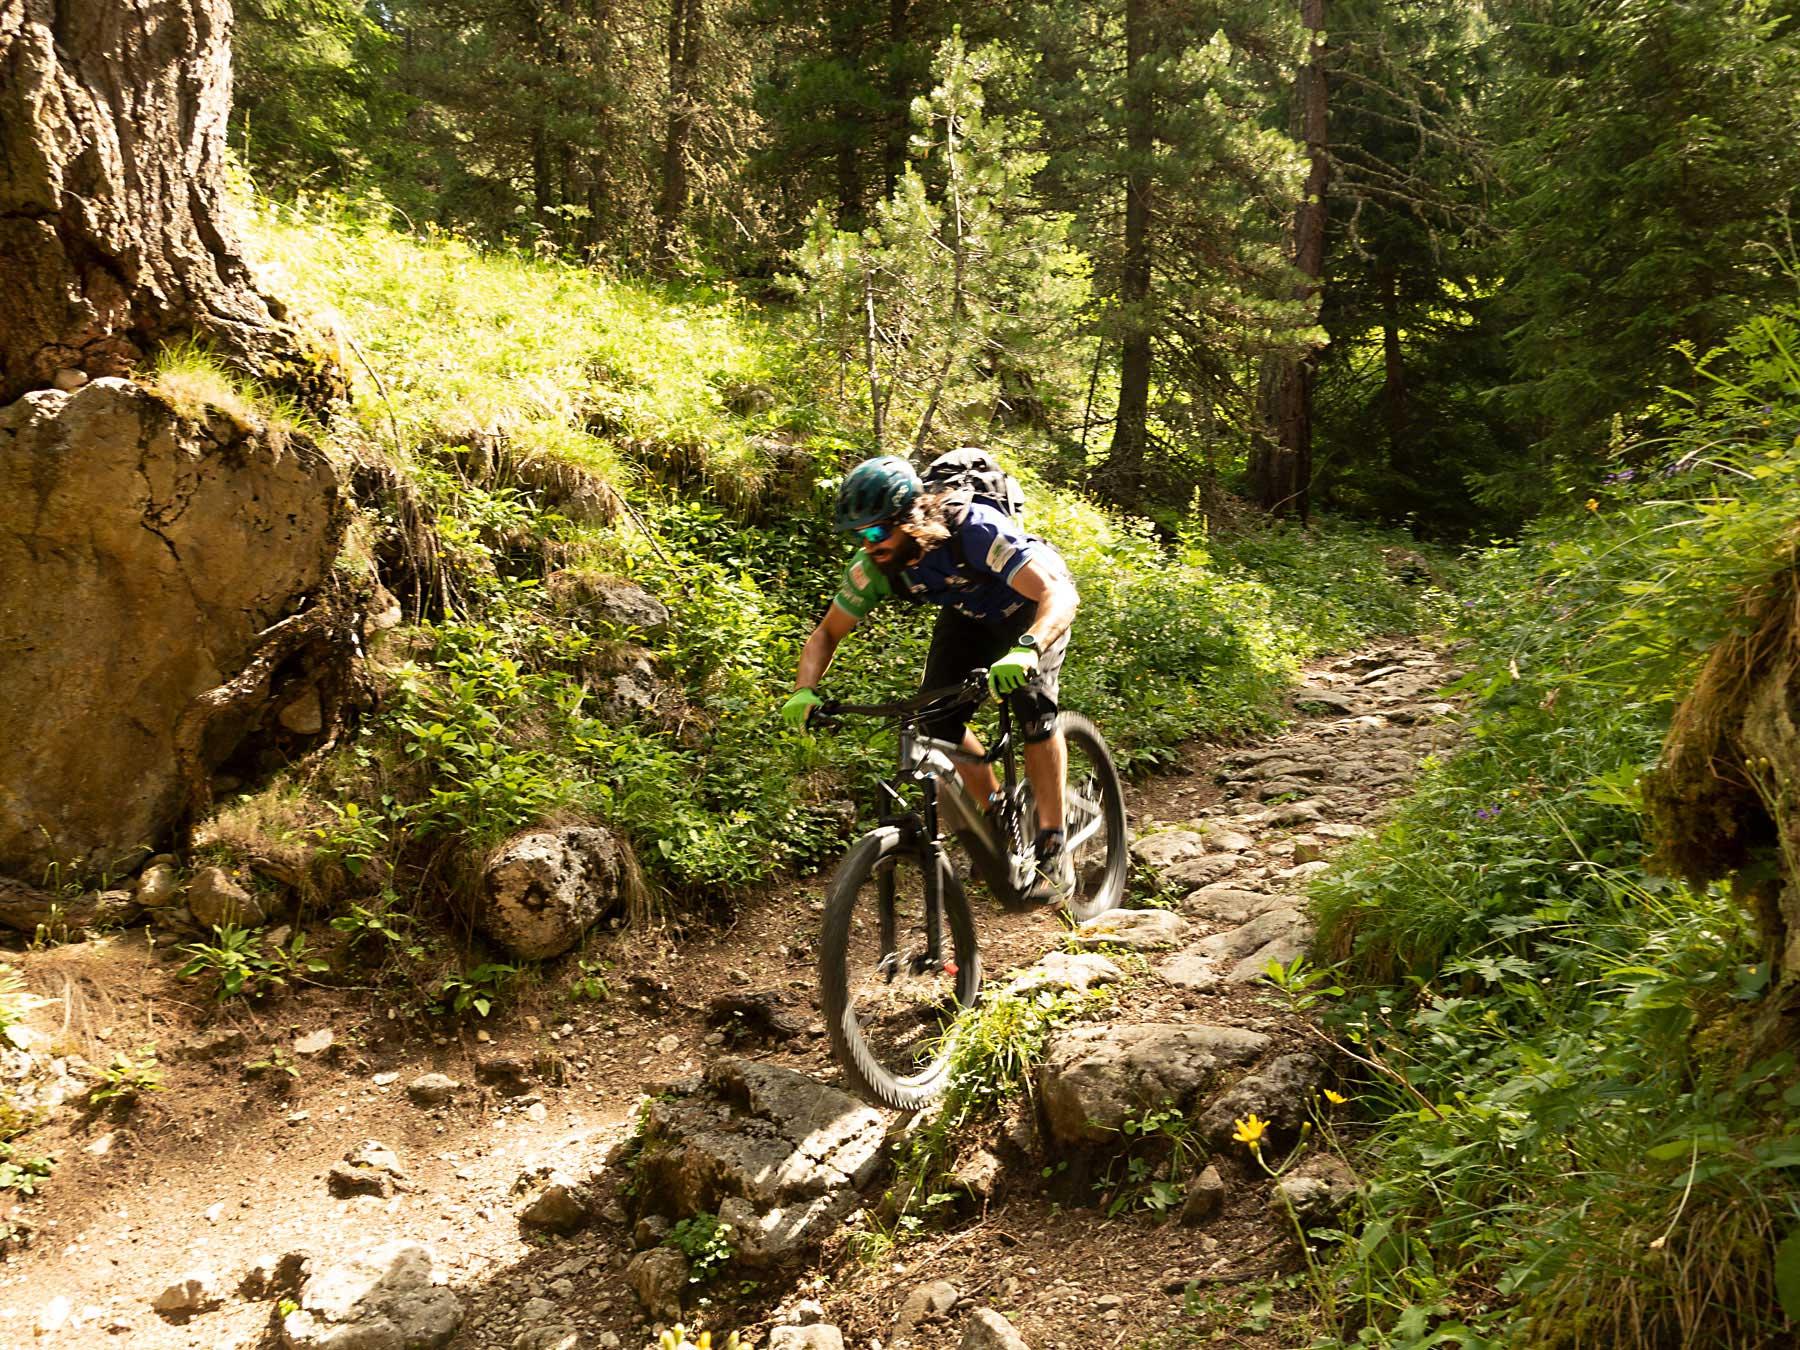 Mtb Trail nel bosco - Sellaronda mtb toure